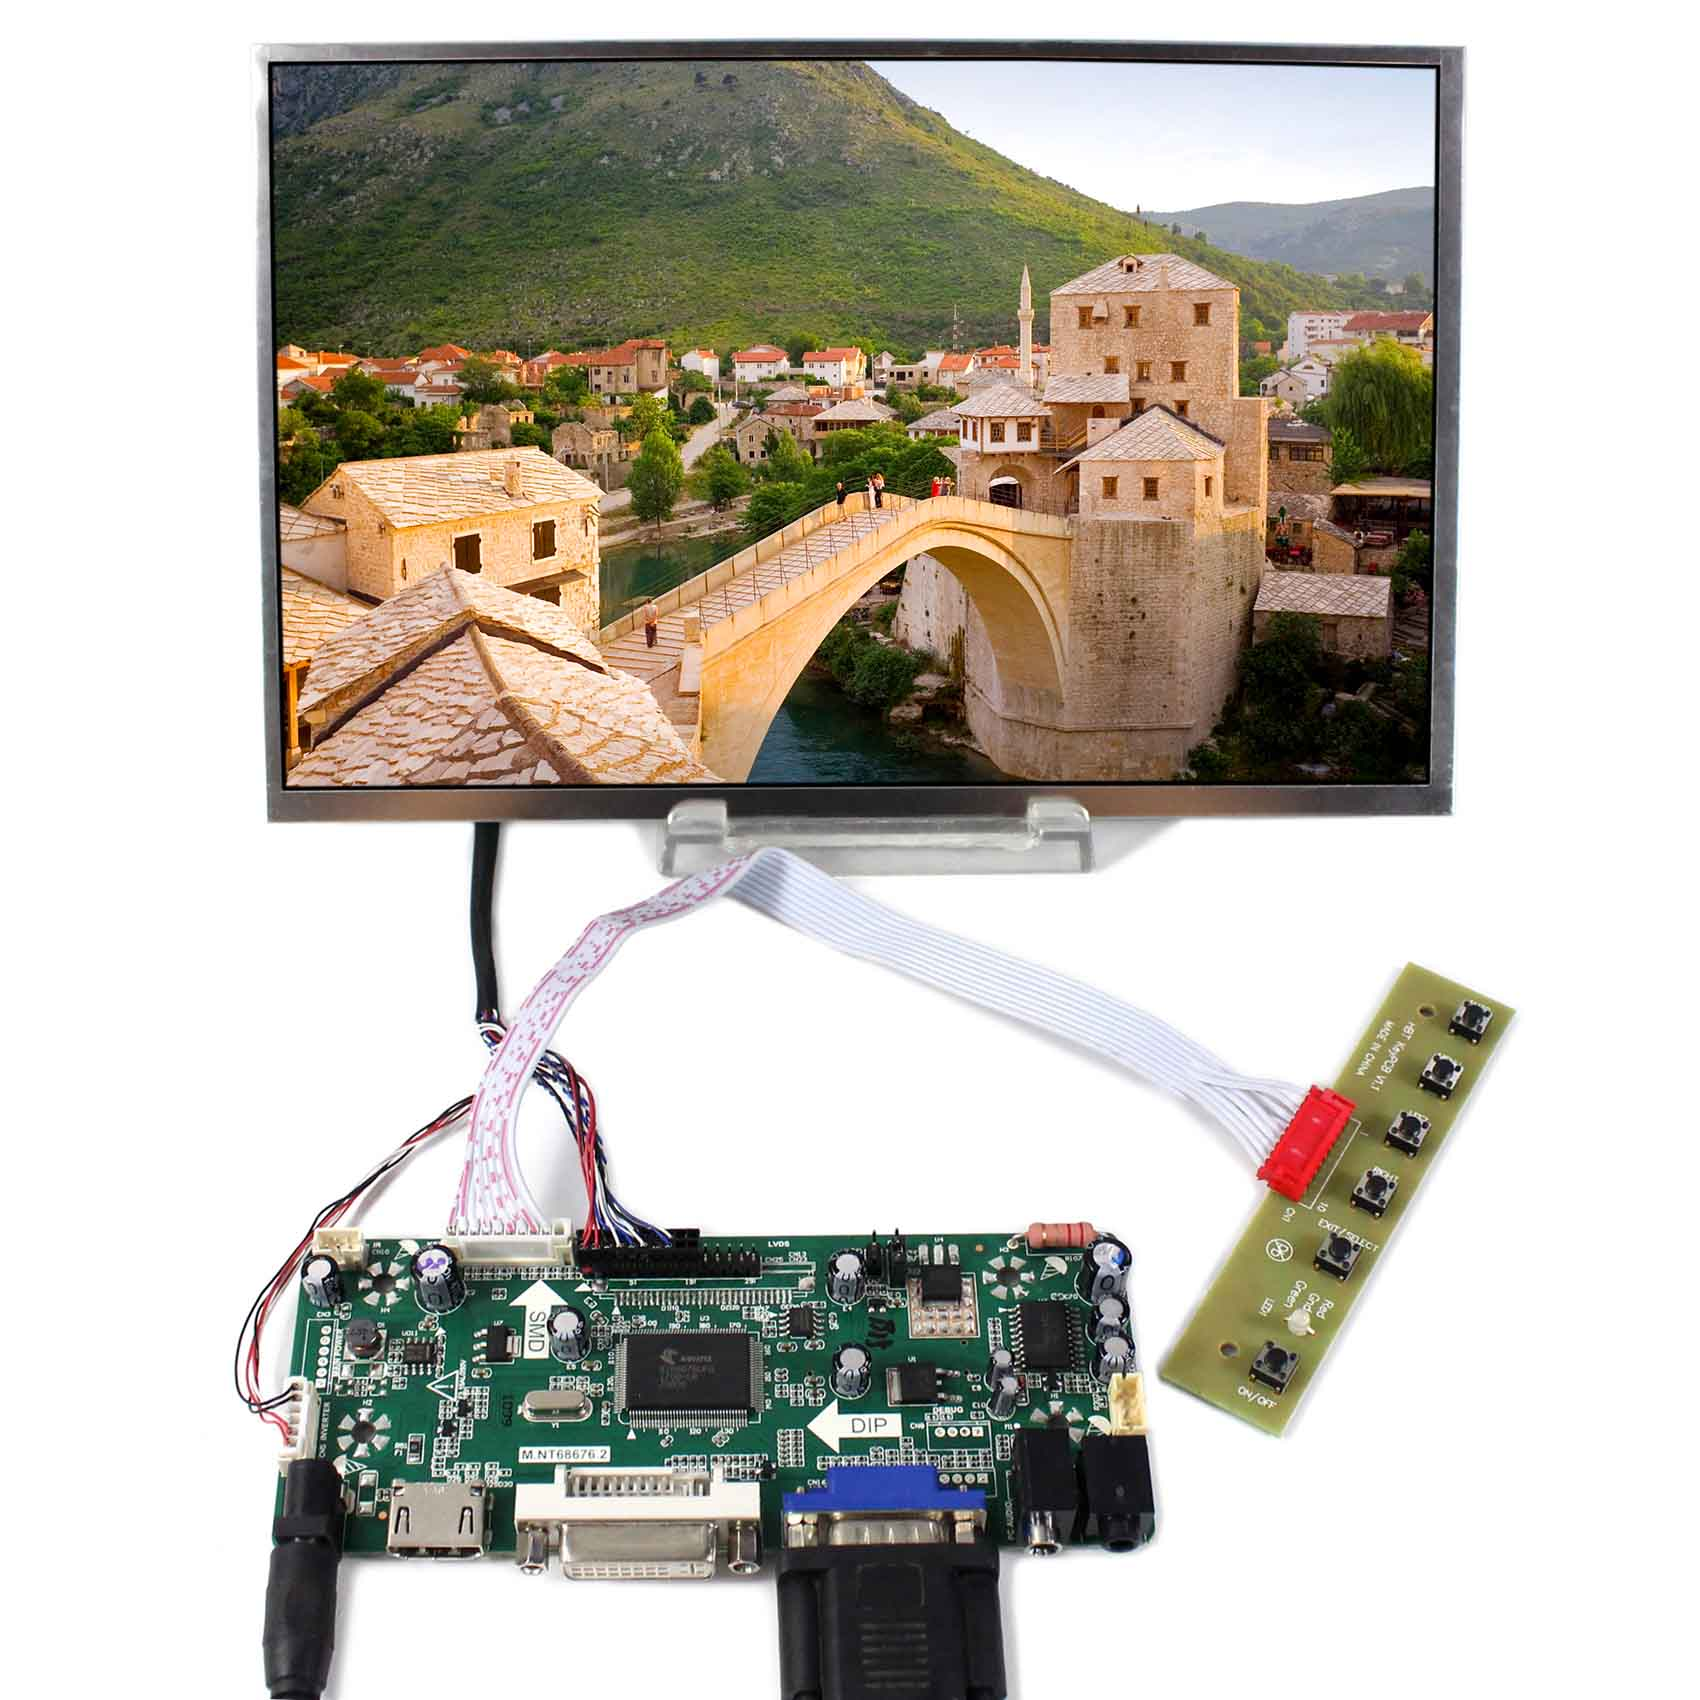 10.1inch B101EW05 1280x800 LCD Screen Wiht HDMI VGA DVI AUDIO LCD Controller Board